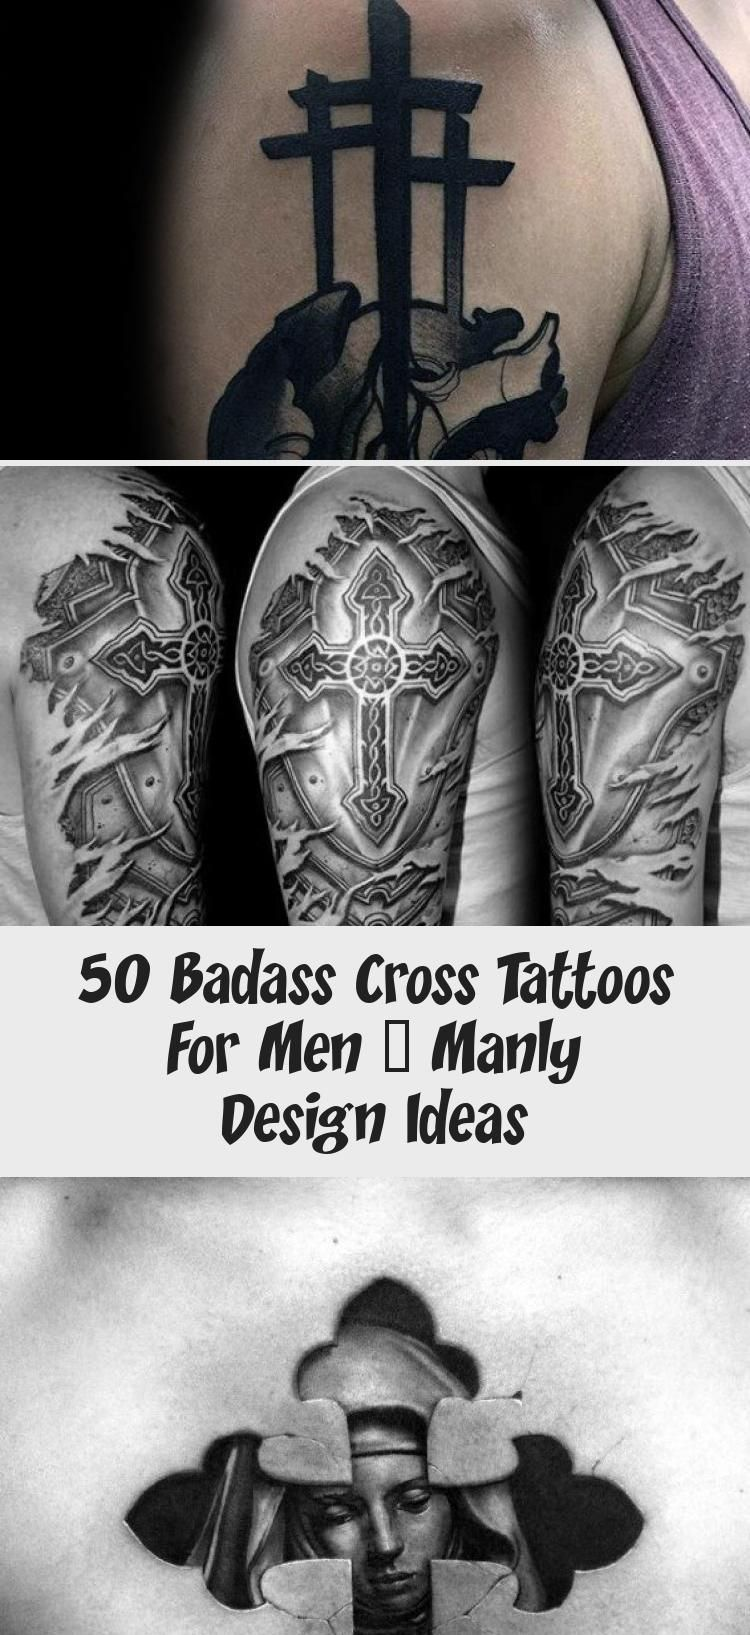 Badass Cross Tattoos : badass, cross, tattoos, Sleeve, Tattoos